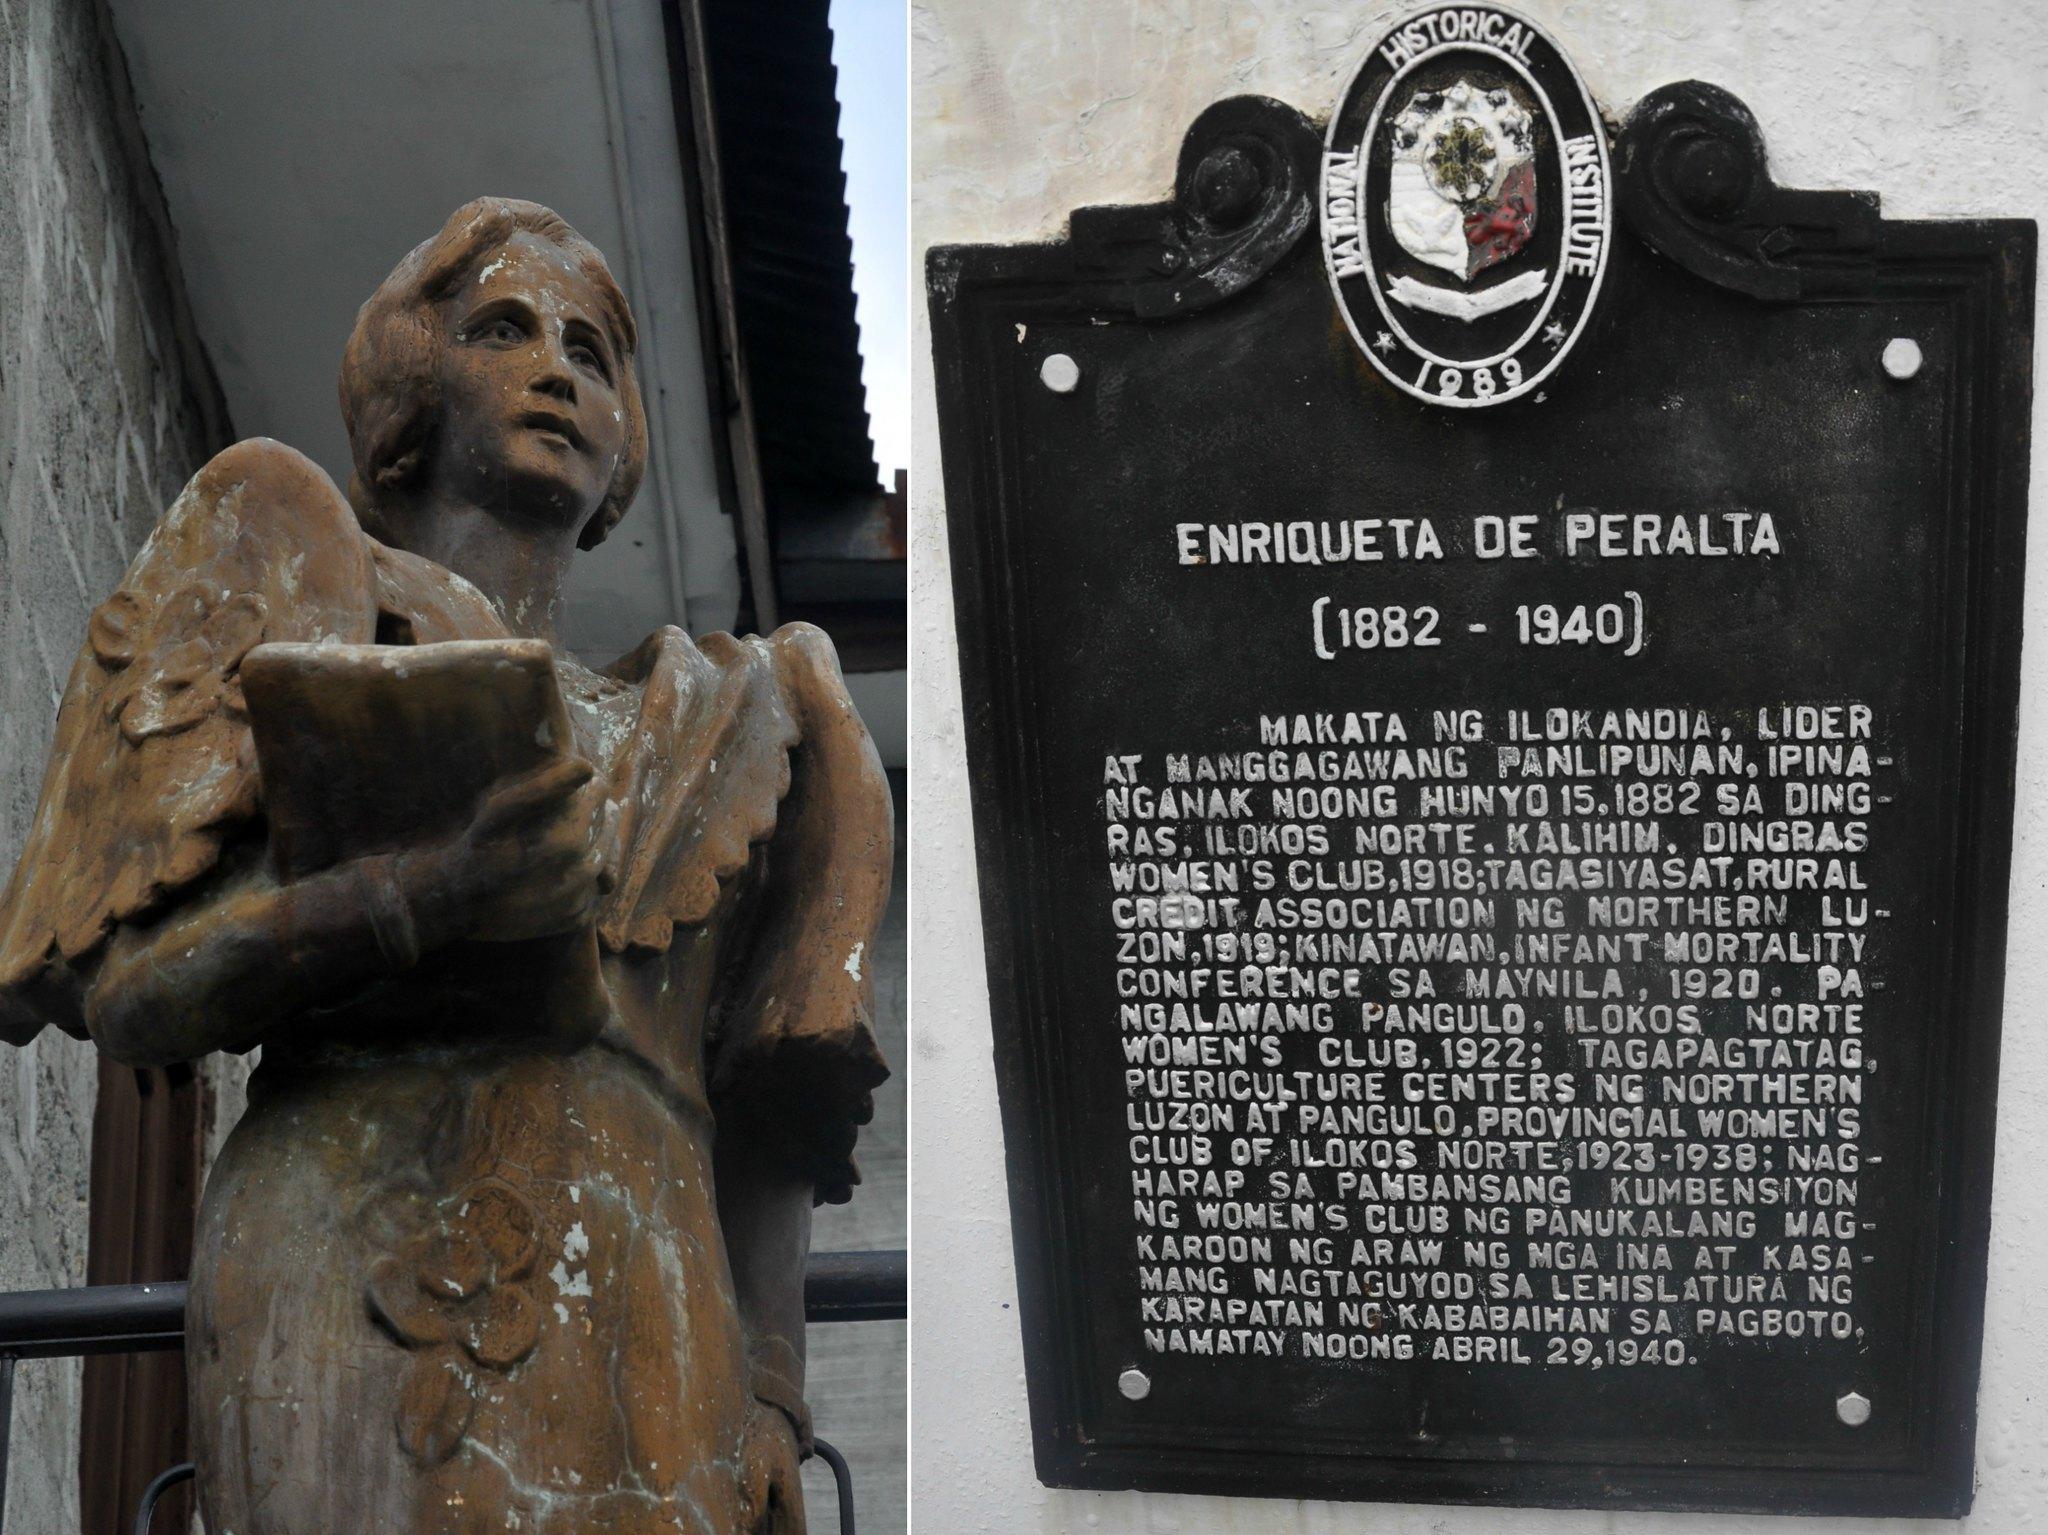 Enriqueta de Peralta